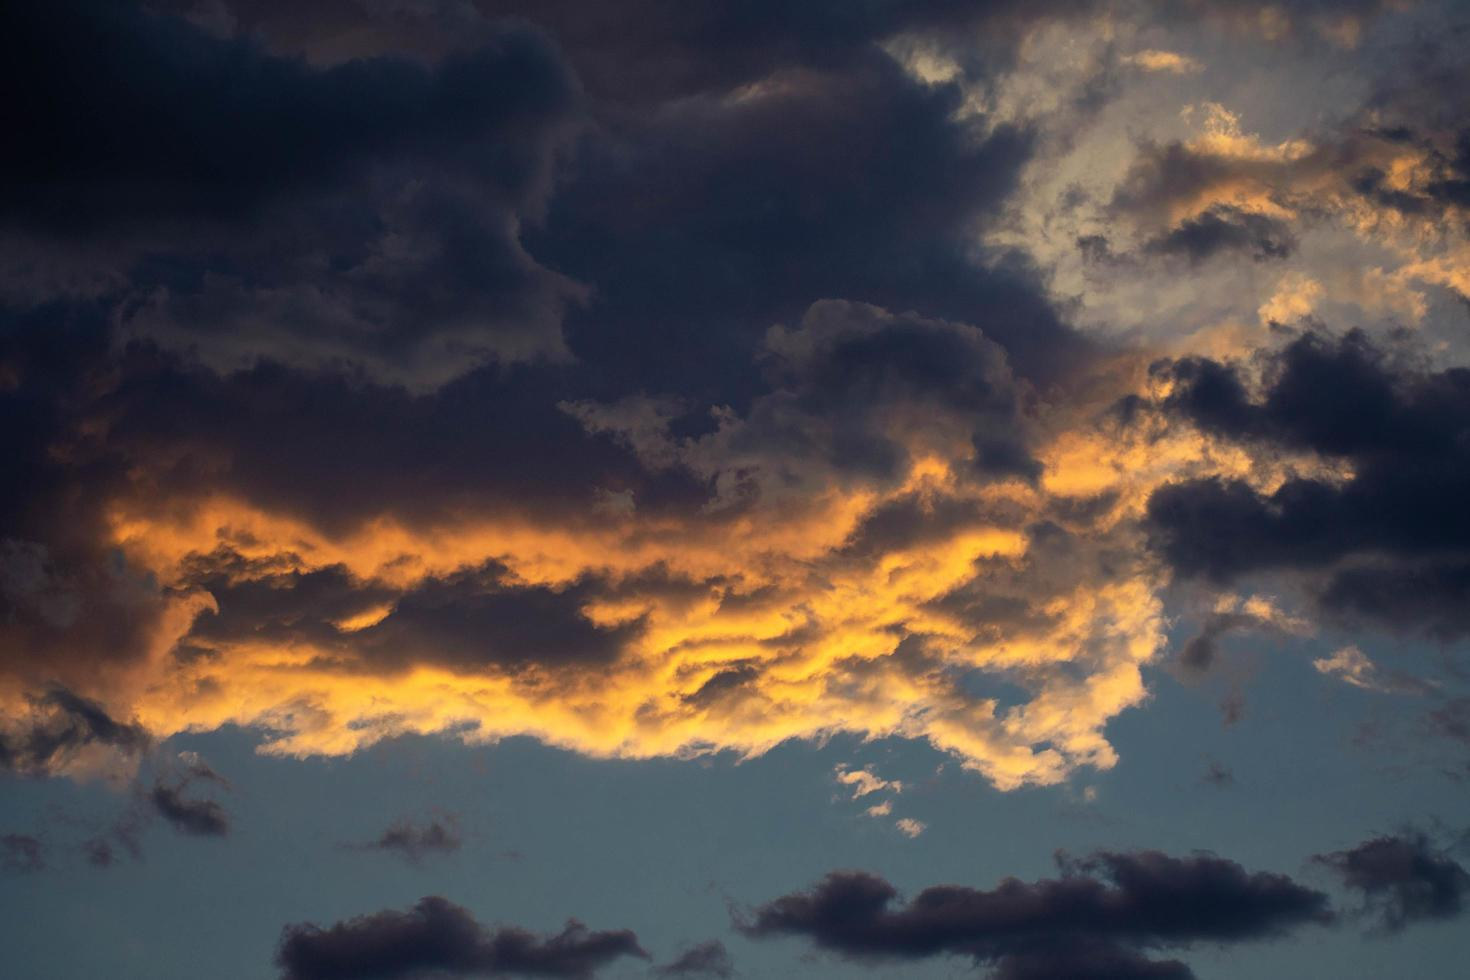 nuvole scure e tempestose foto